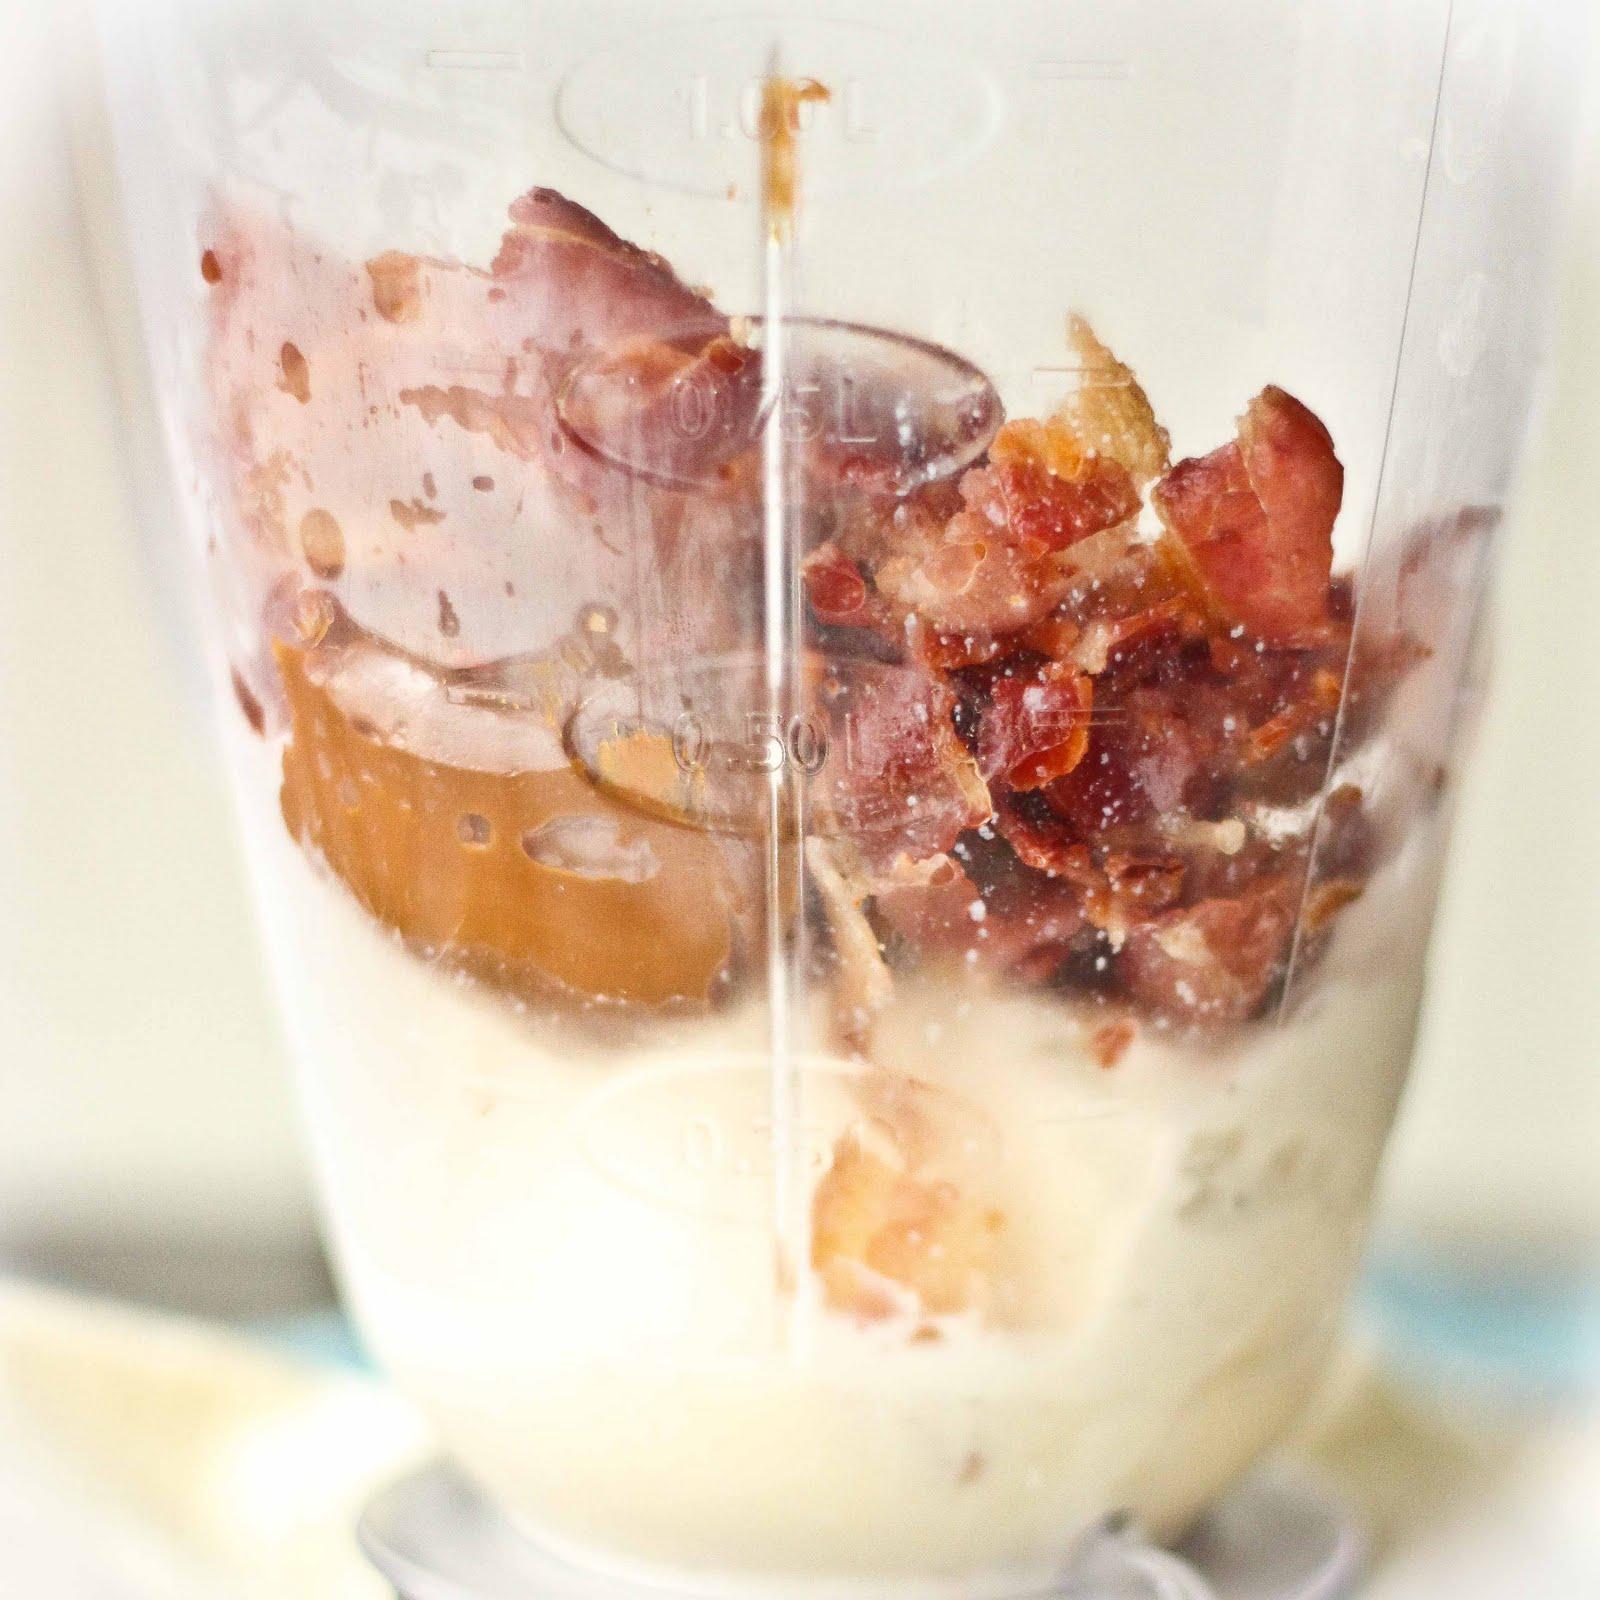 http://2.bp.blogspot.com/-JNNu1RDwijg/Ty_DZzT7XCI/AAAAAAAAHos/wt18Uxn9W9E/s1600/Bacon+Milkshake.jpg